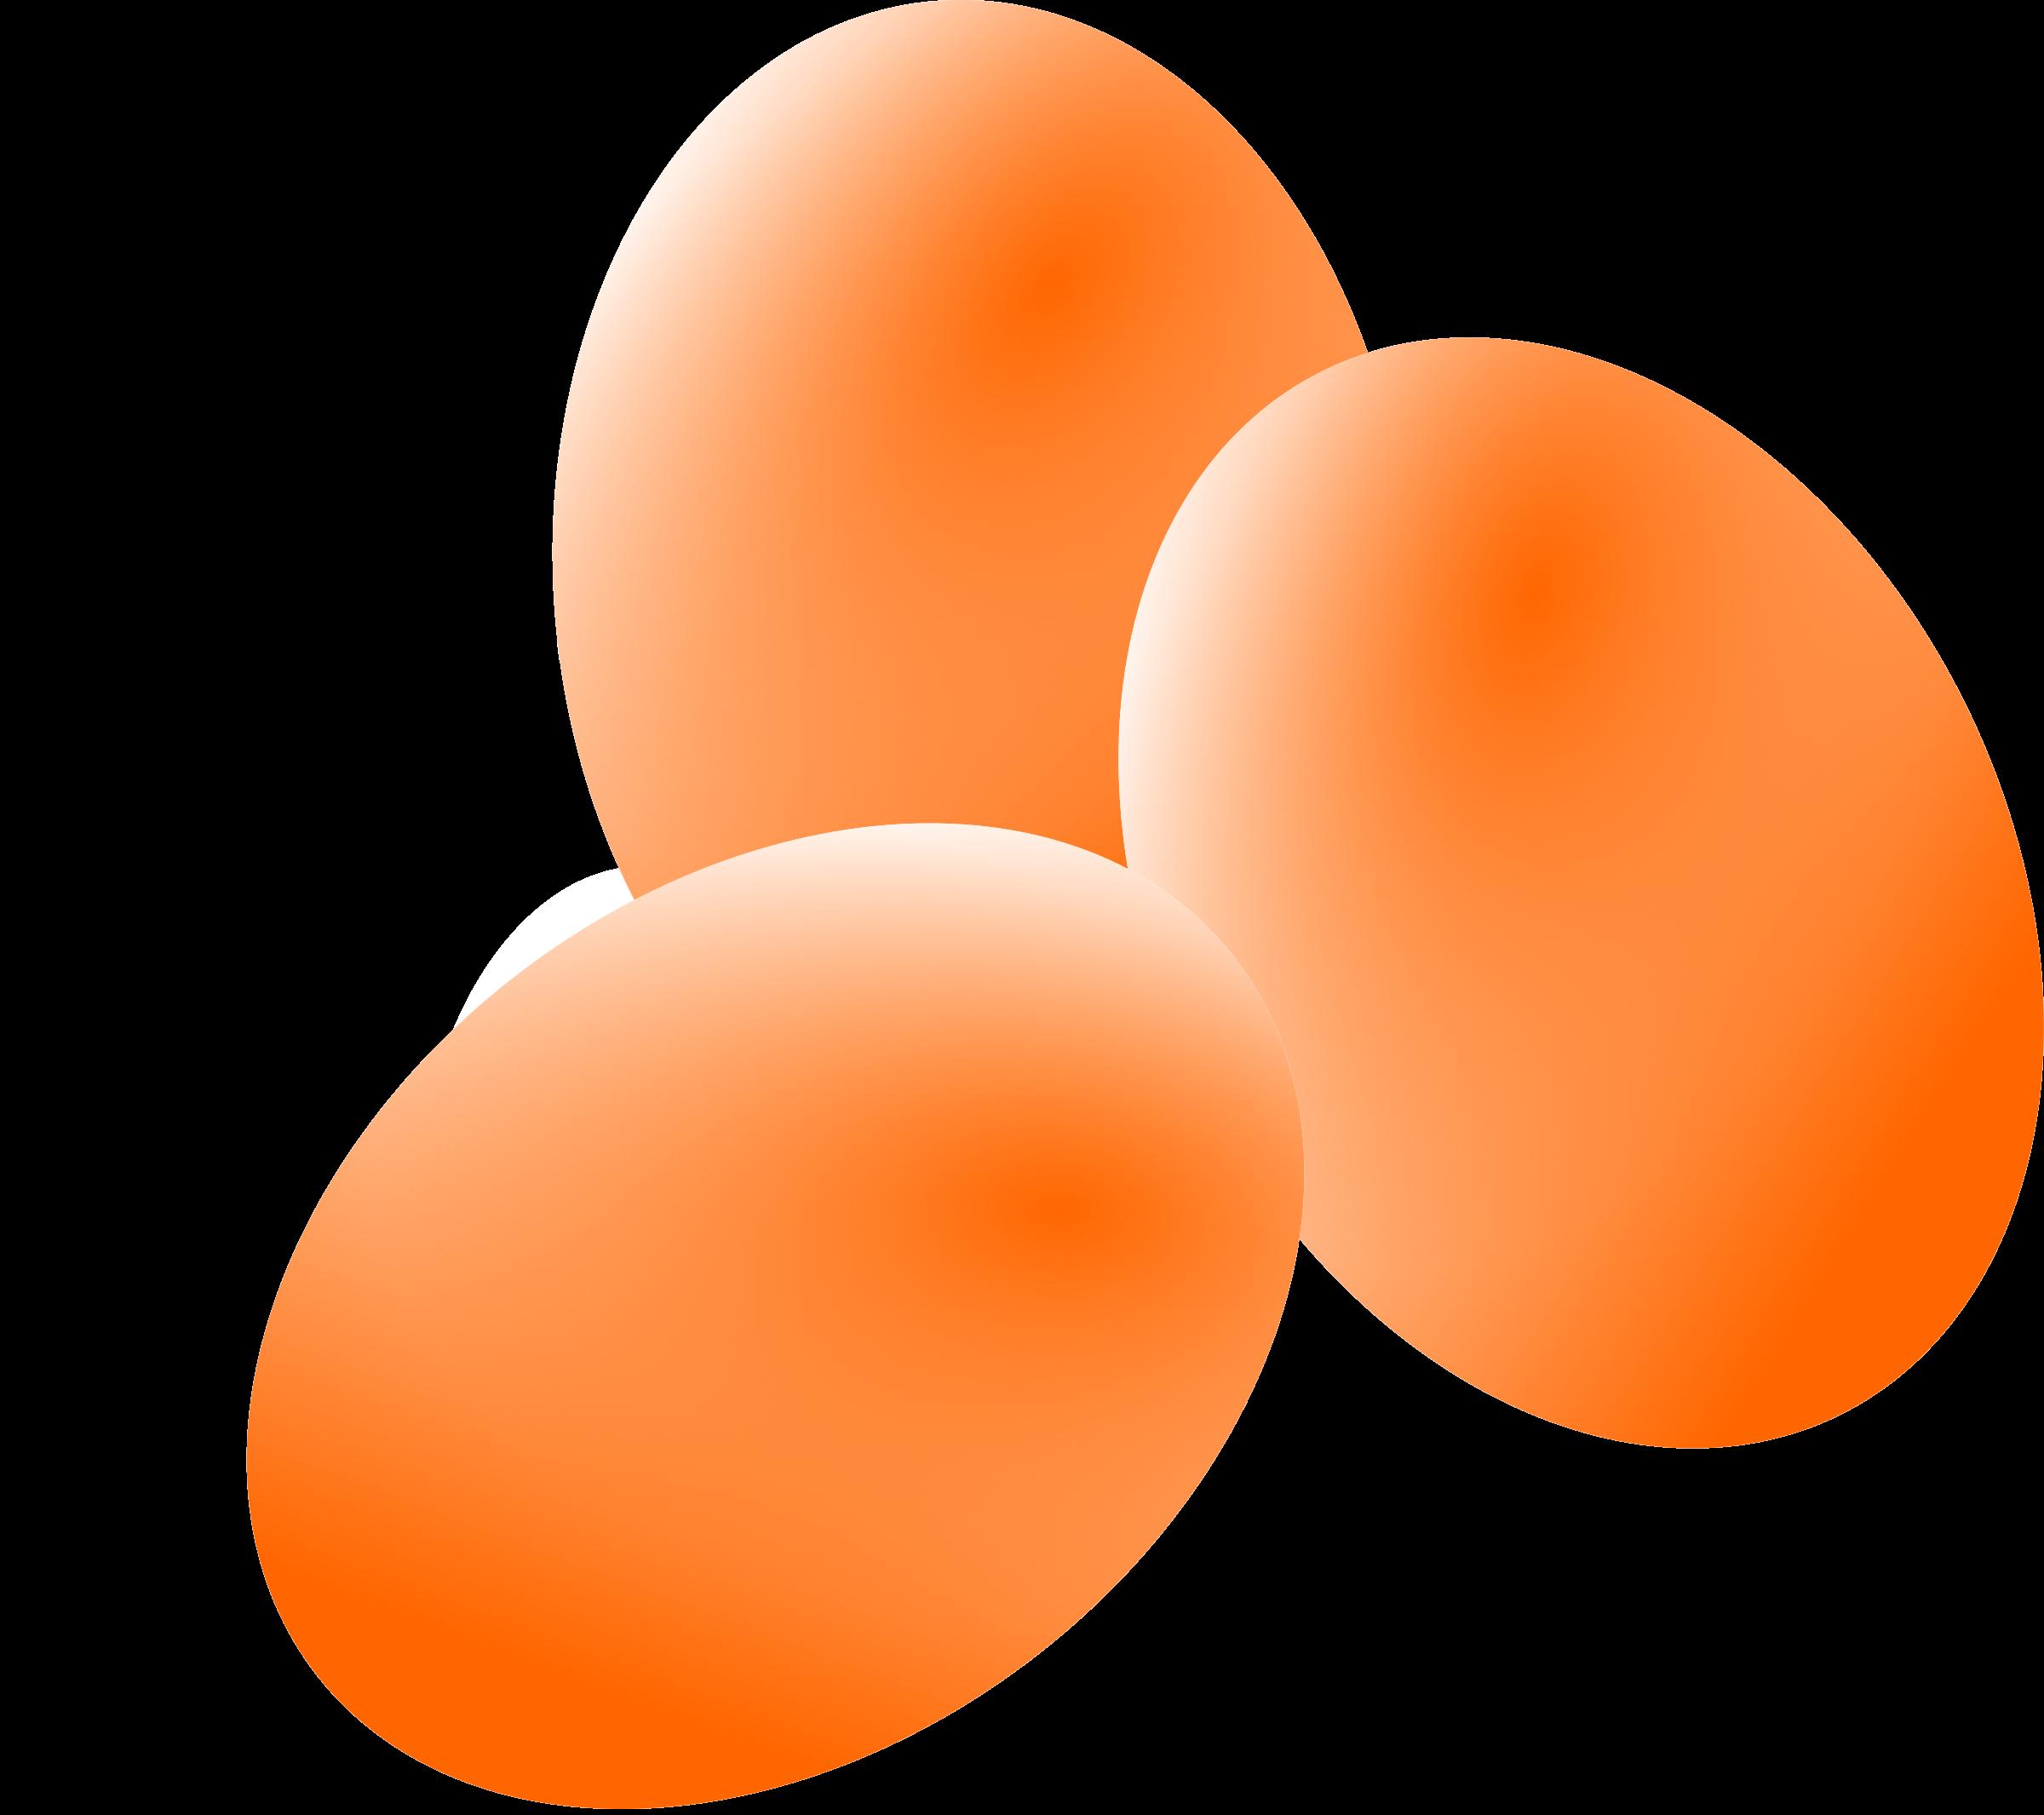 2400x2131 Egg Clip Art Free Clipart Images 2